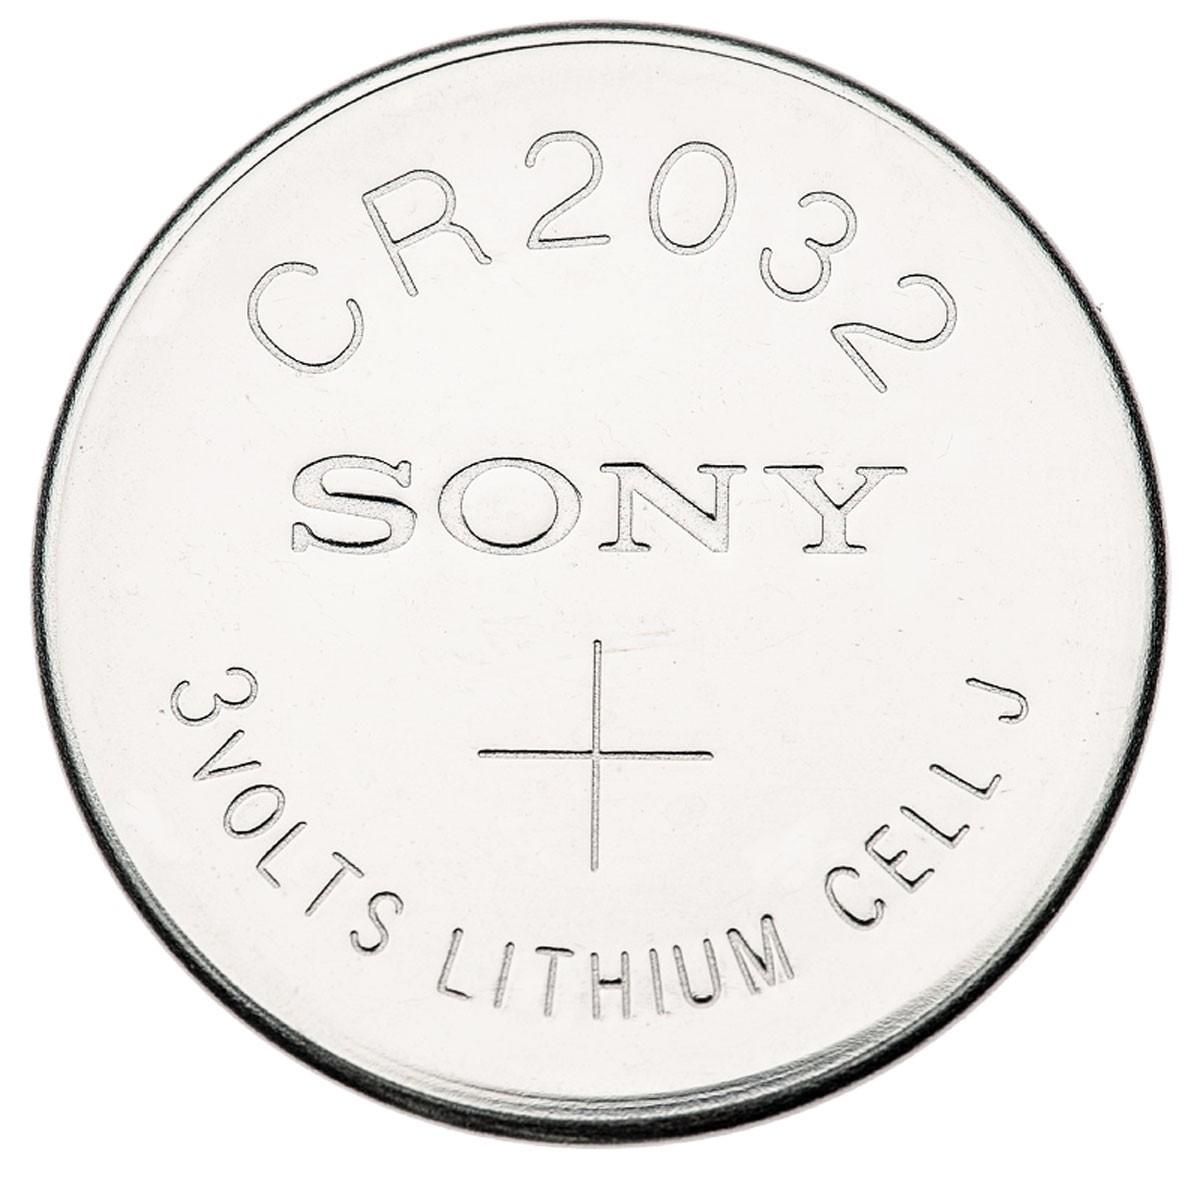 Baterie 1001390954 ve slevě – kupujte ihned!